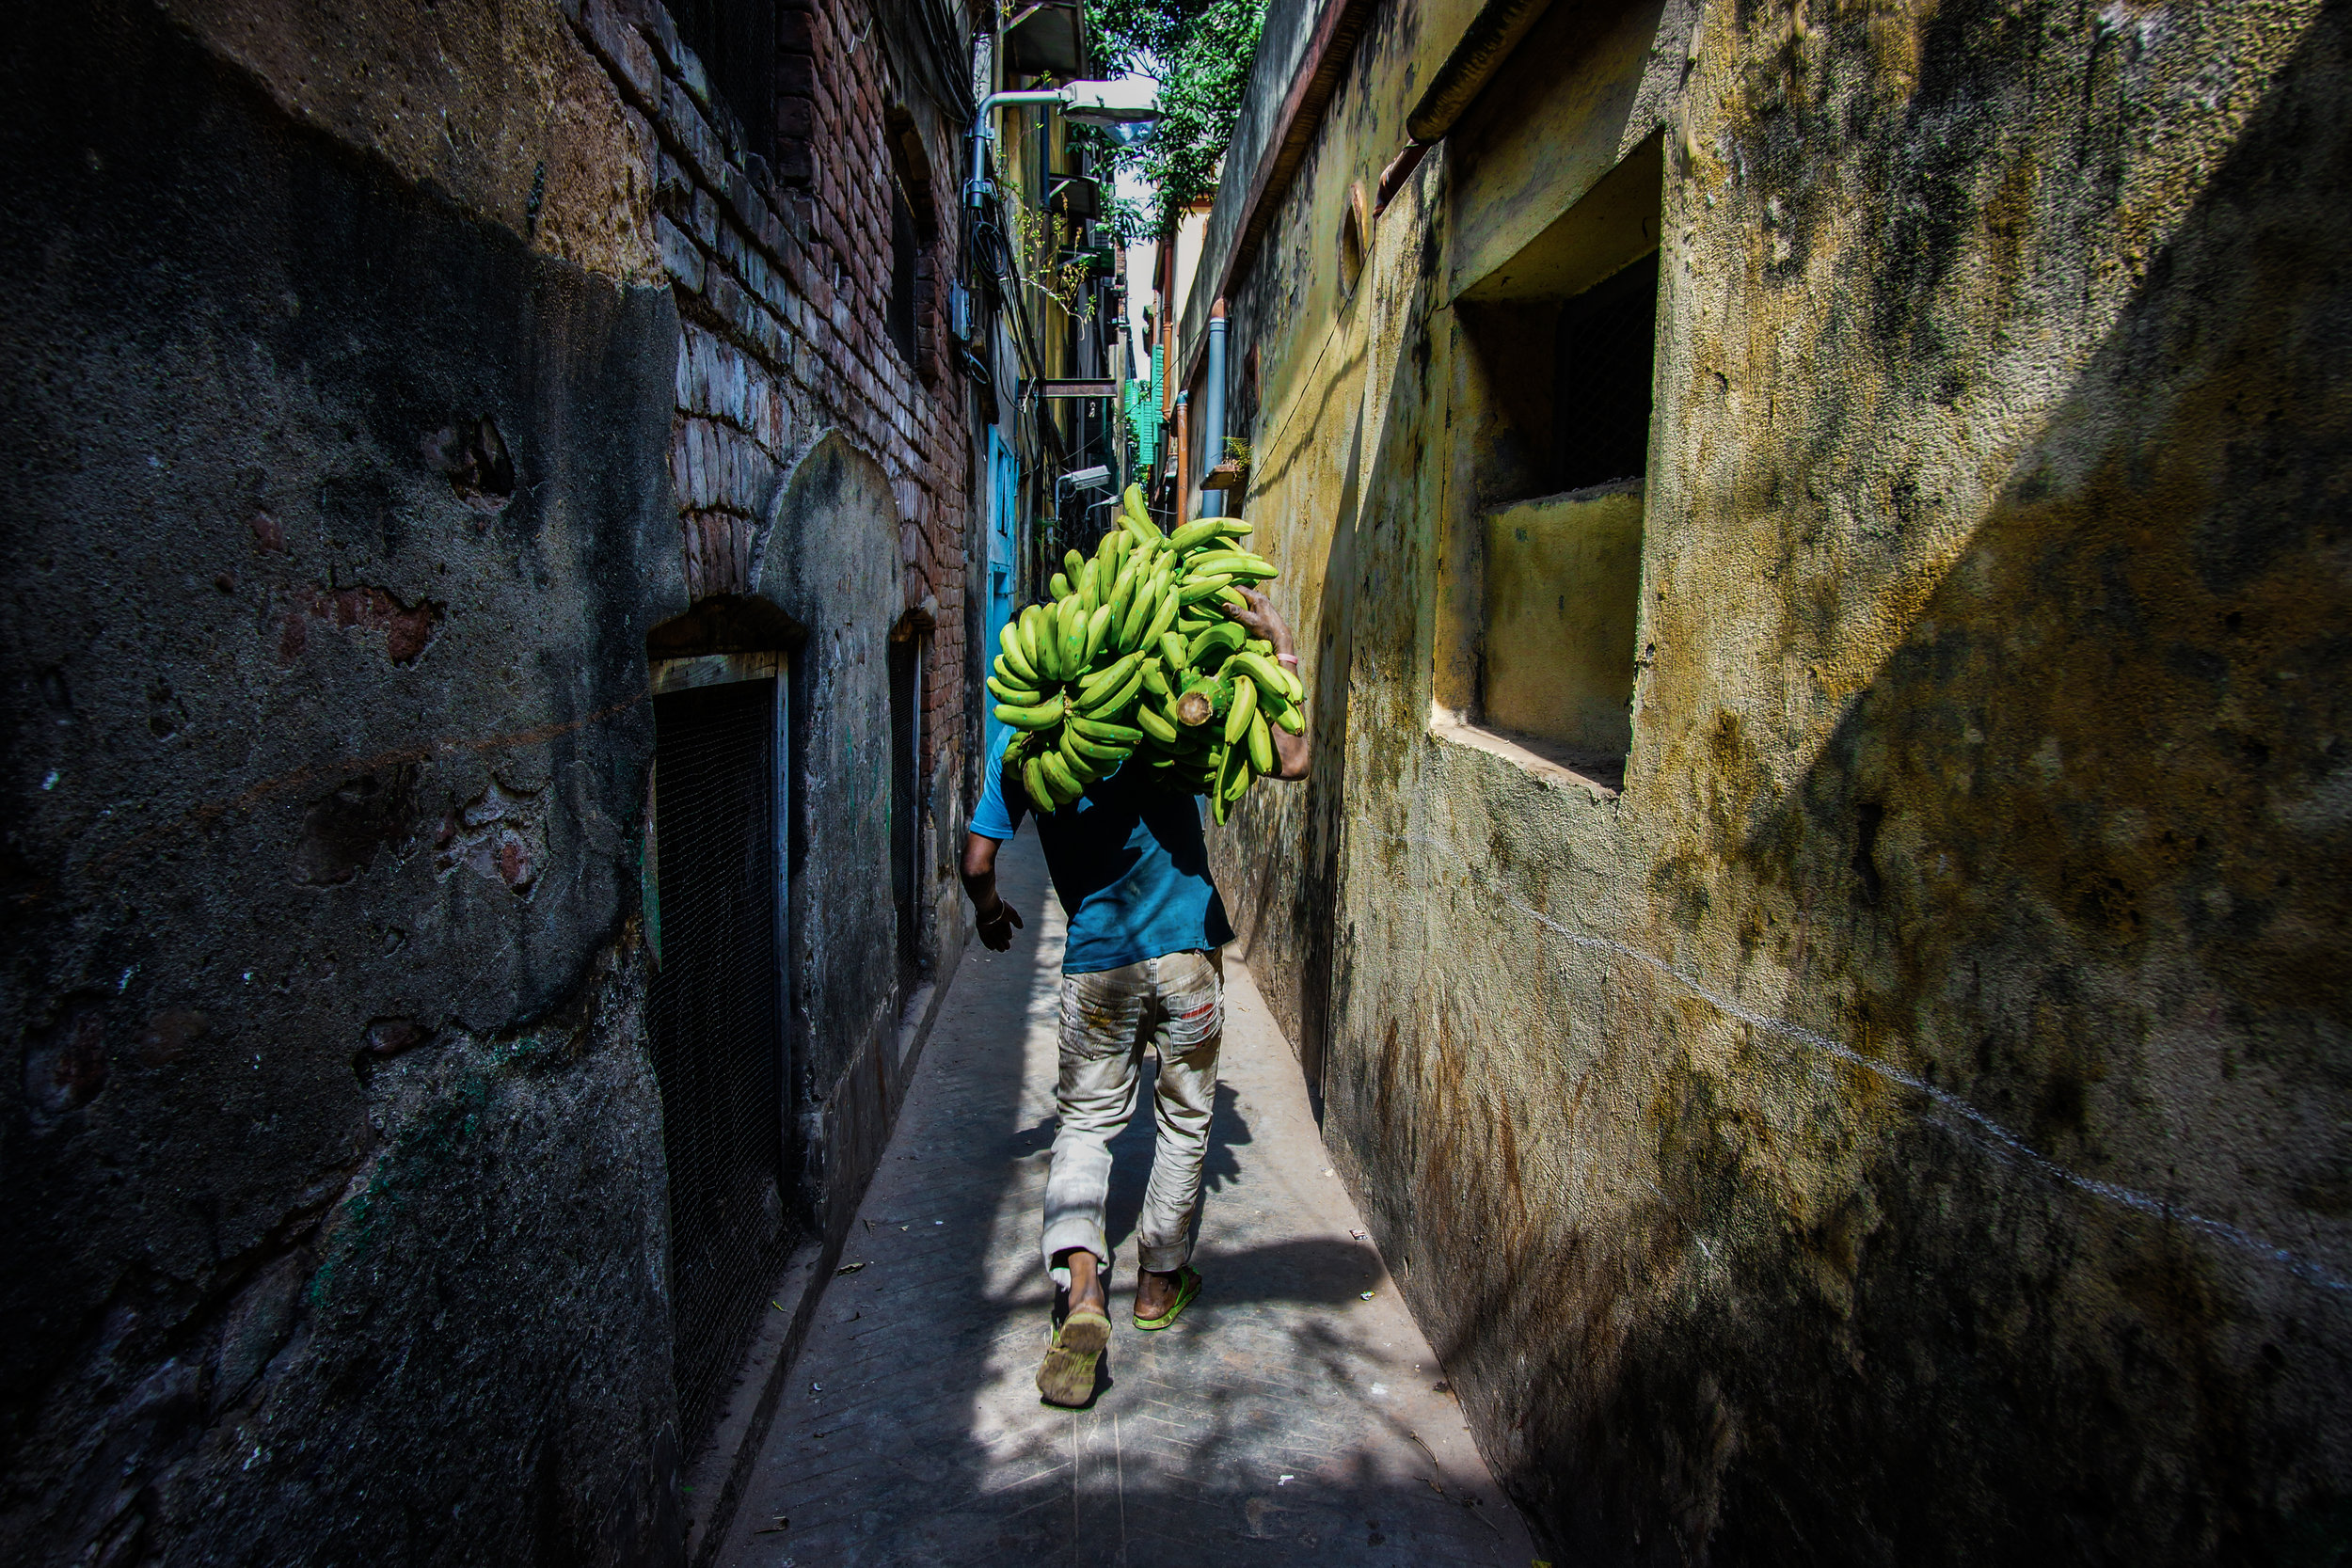 Suvomoy Nandy   Narrow lanes of Calcutta